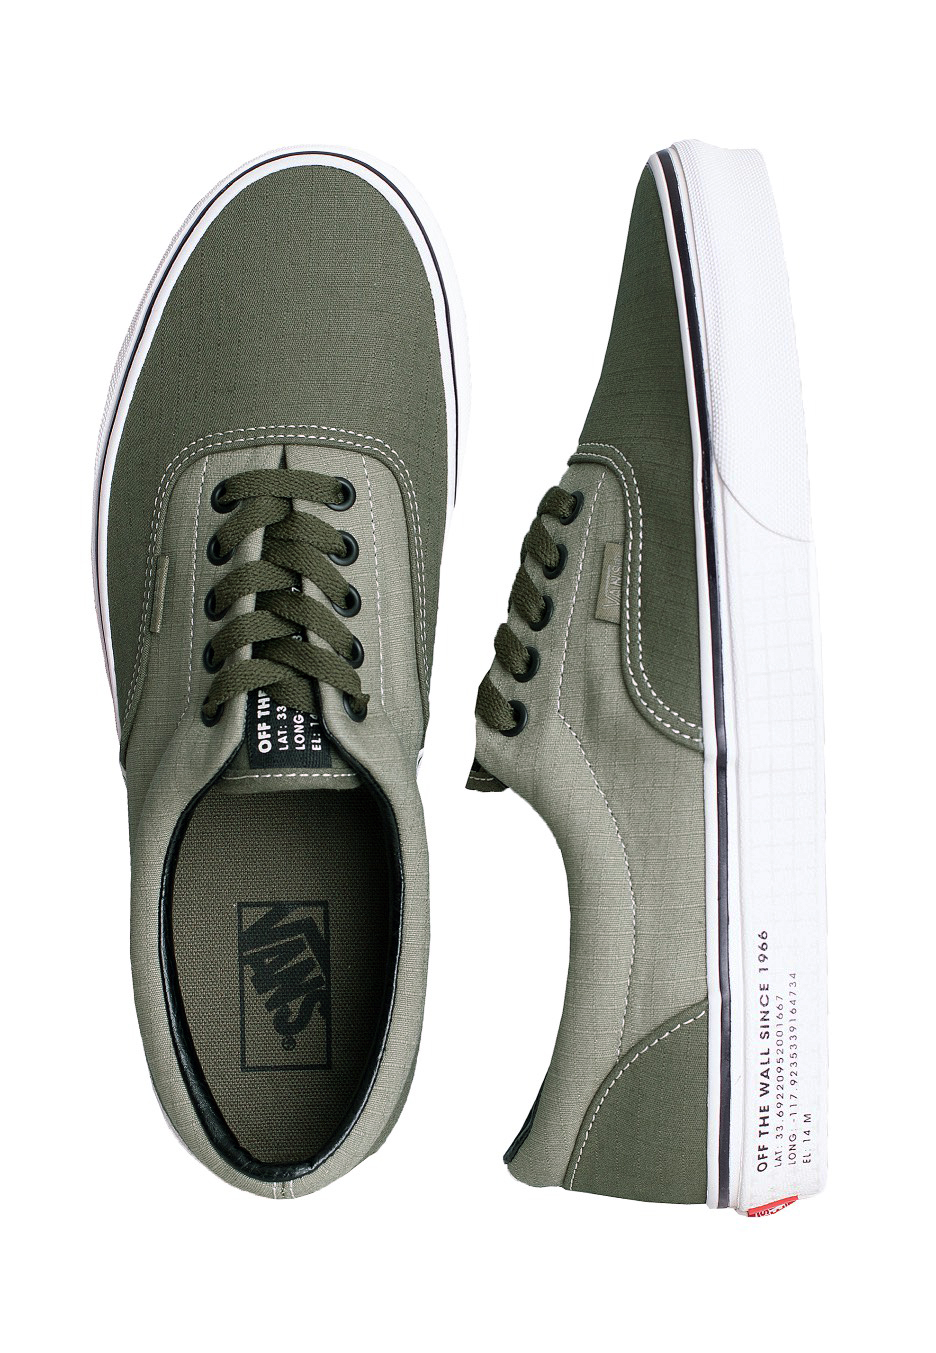 Vans - Era (66 Supply) Vetiver/Grape Leaf - Shoes - Impericon.com ...